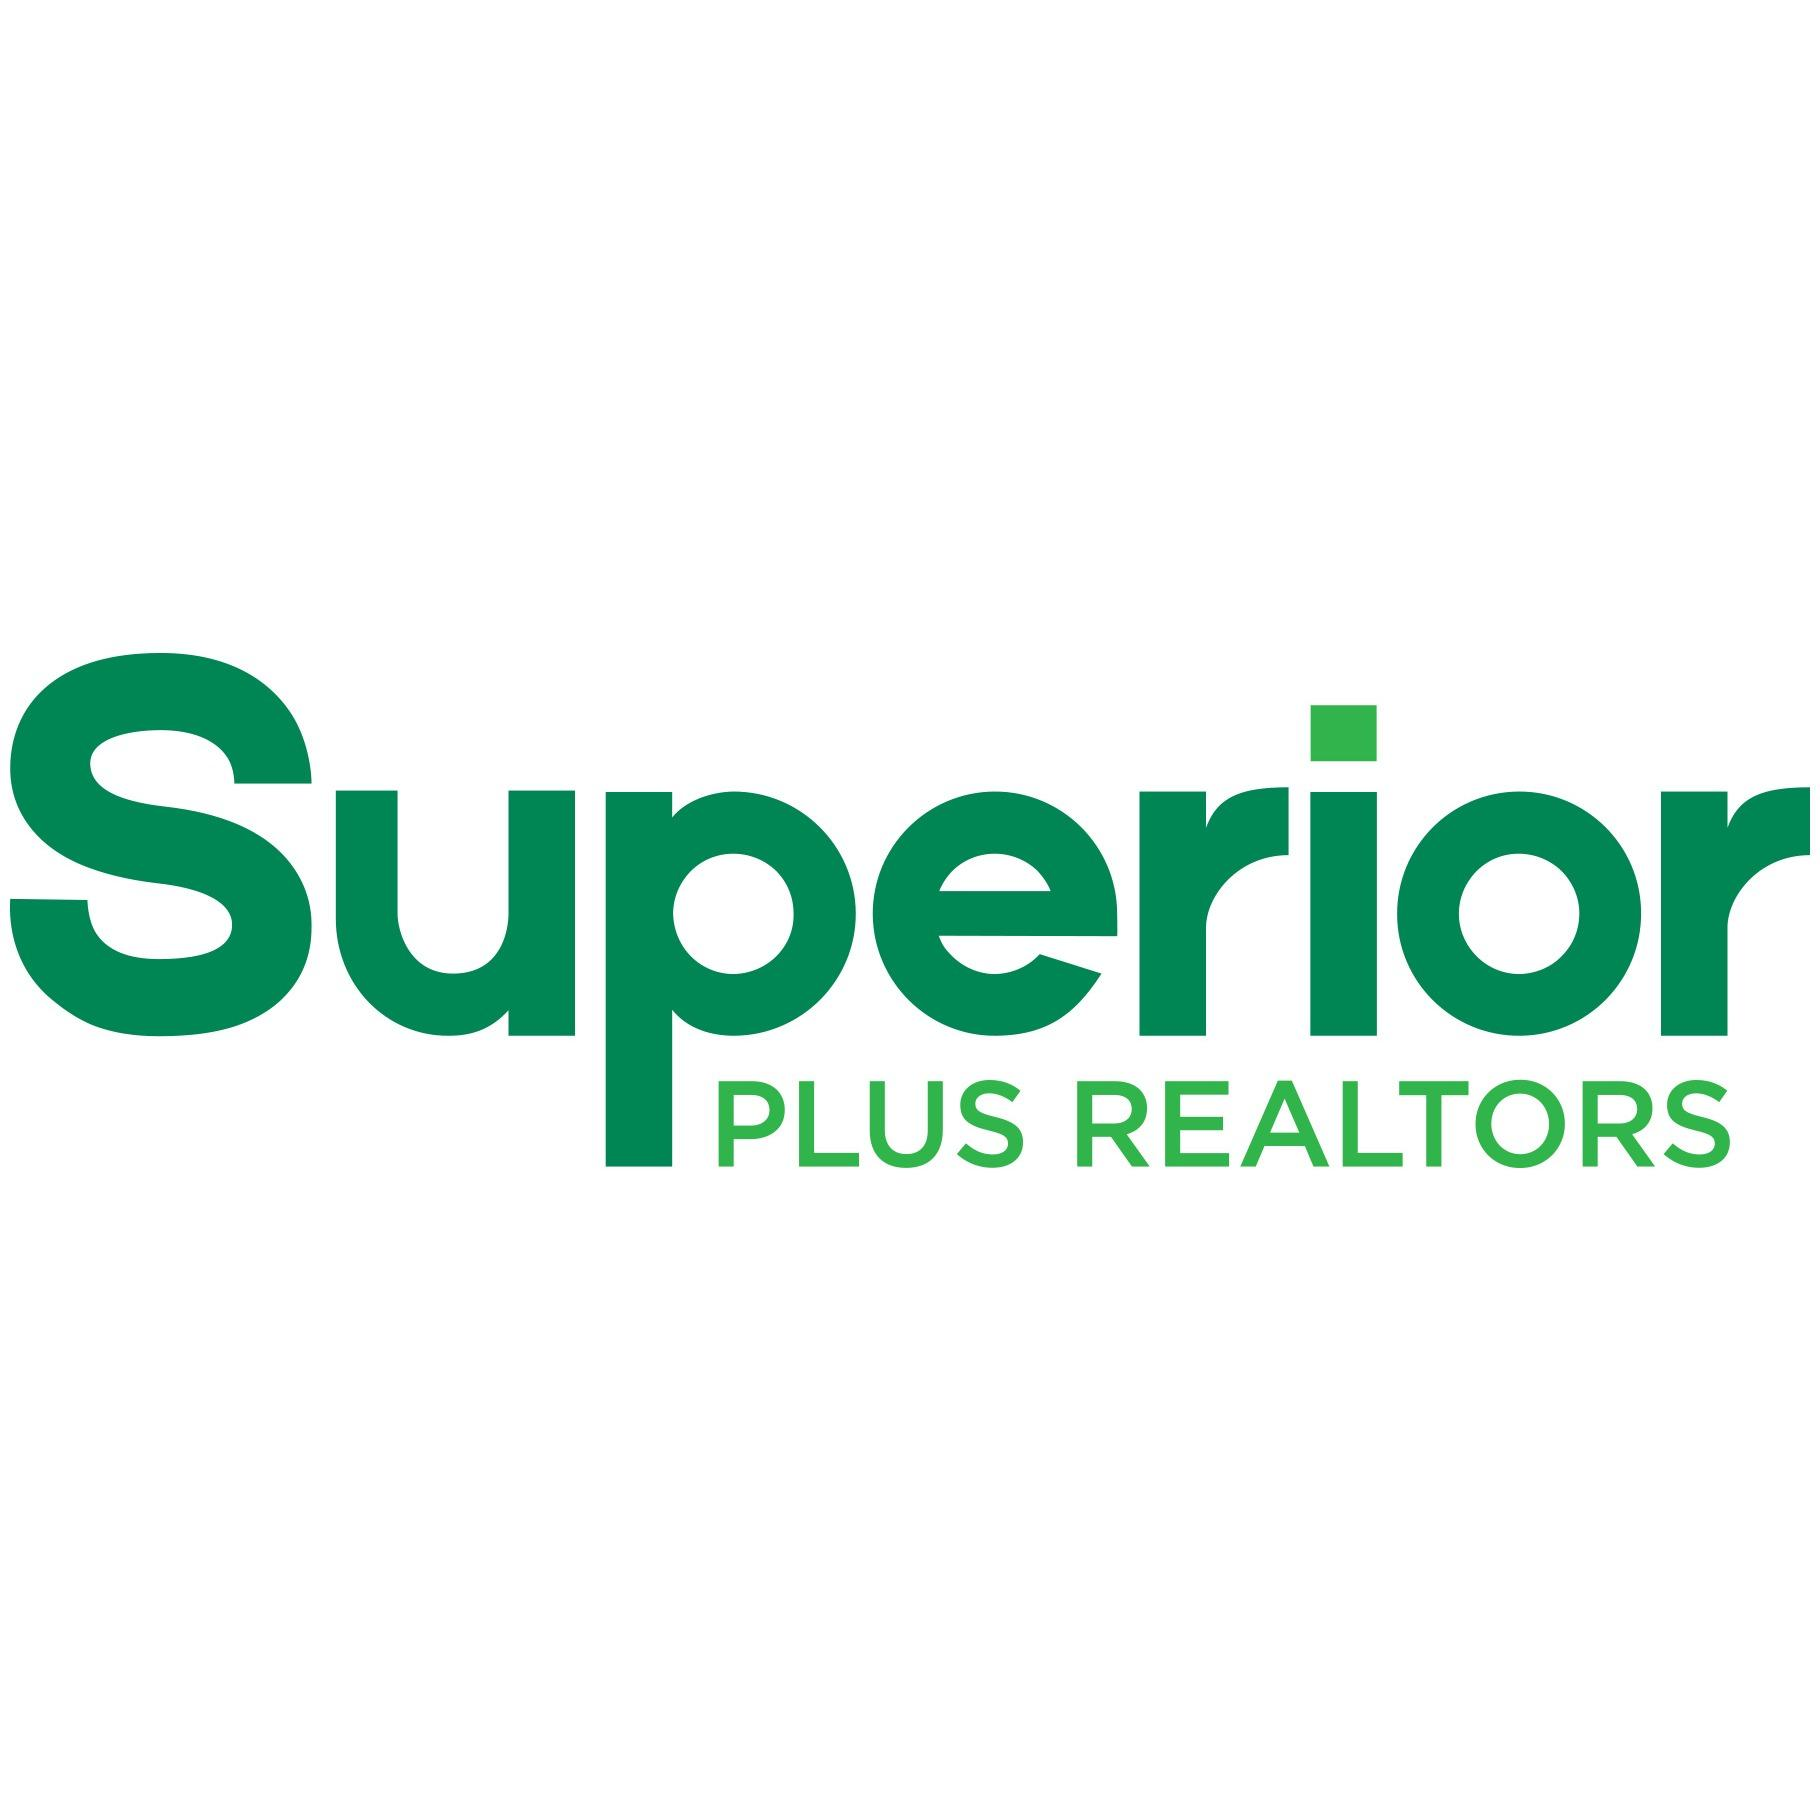 Superior PLUS Realtors